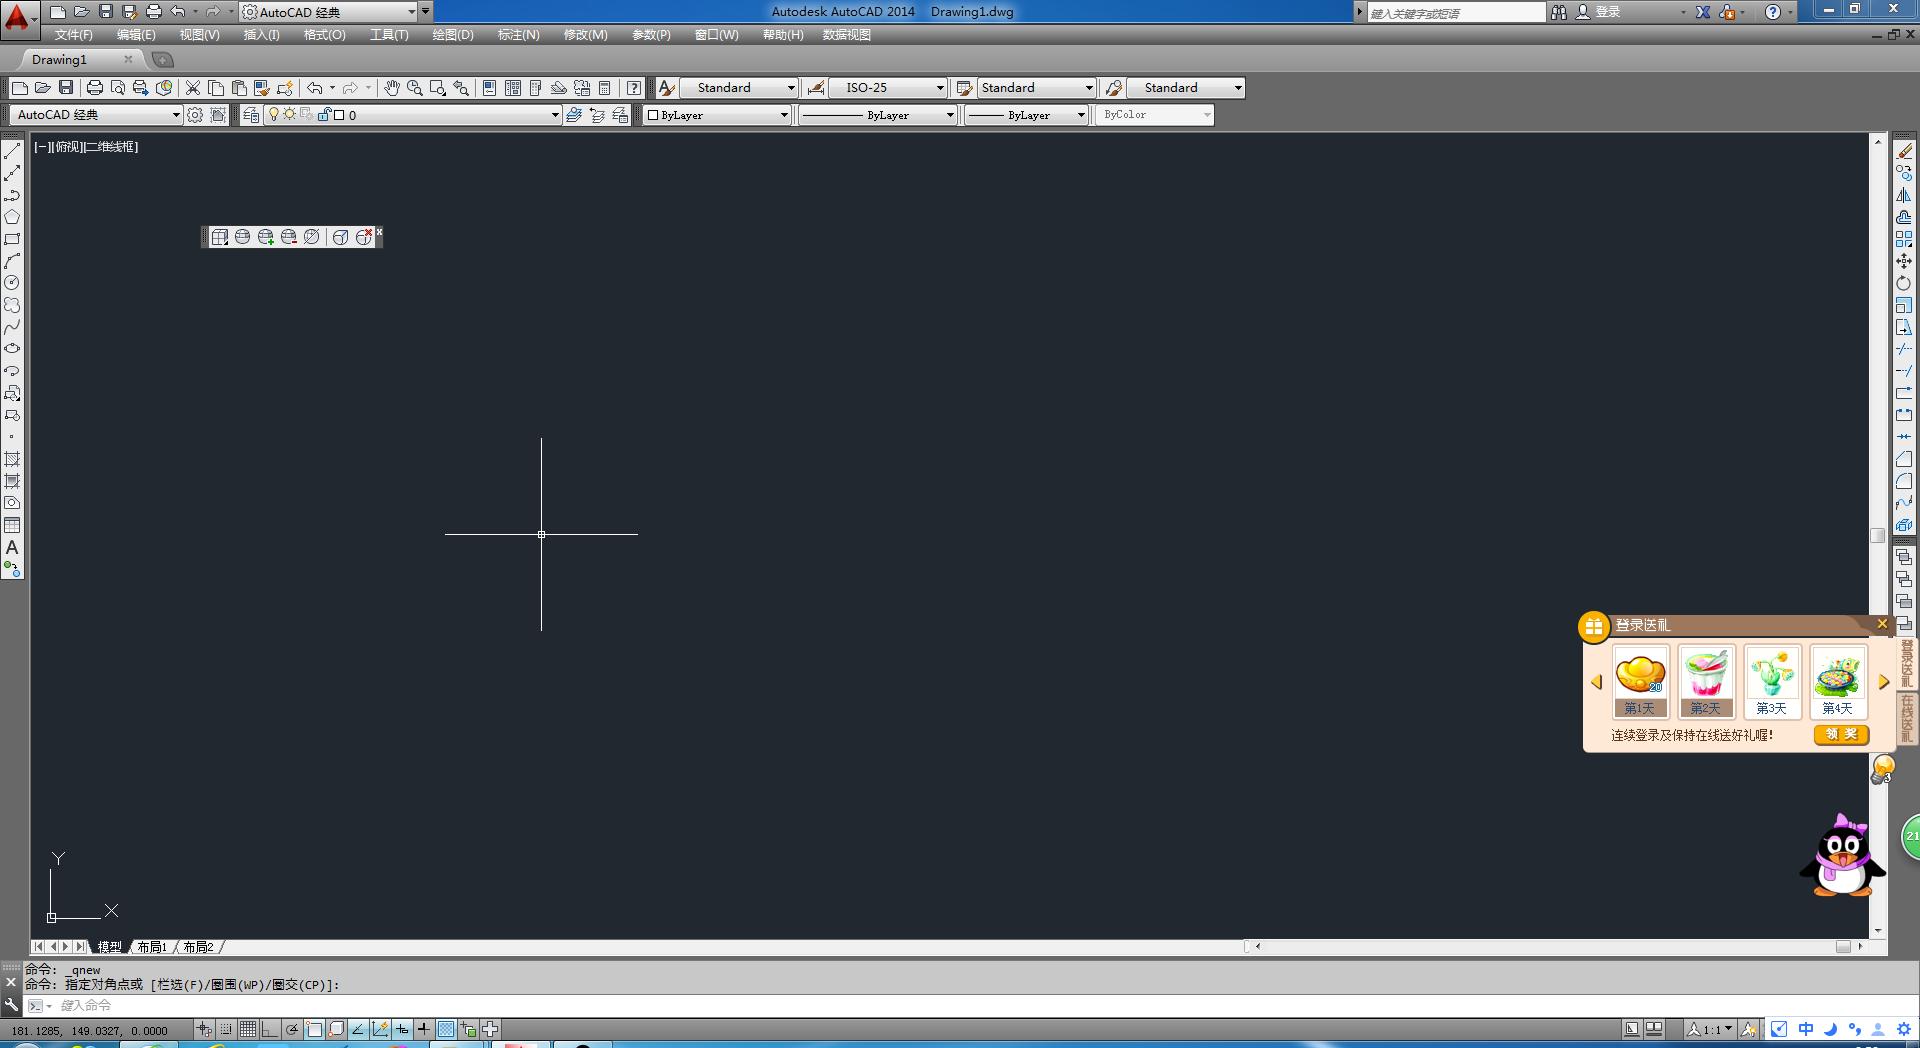 CAD原来打开后文件名复制了drawing1,且重新不同cad变成如何之间图片